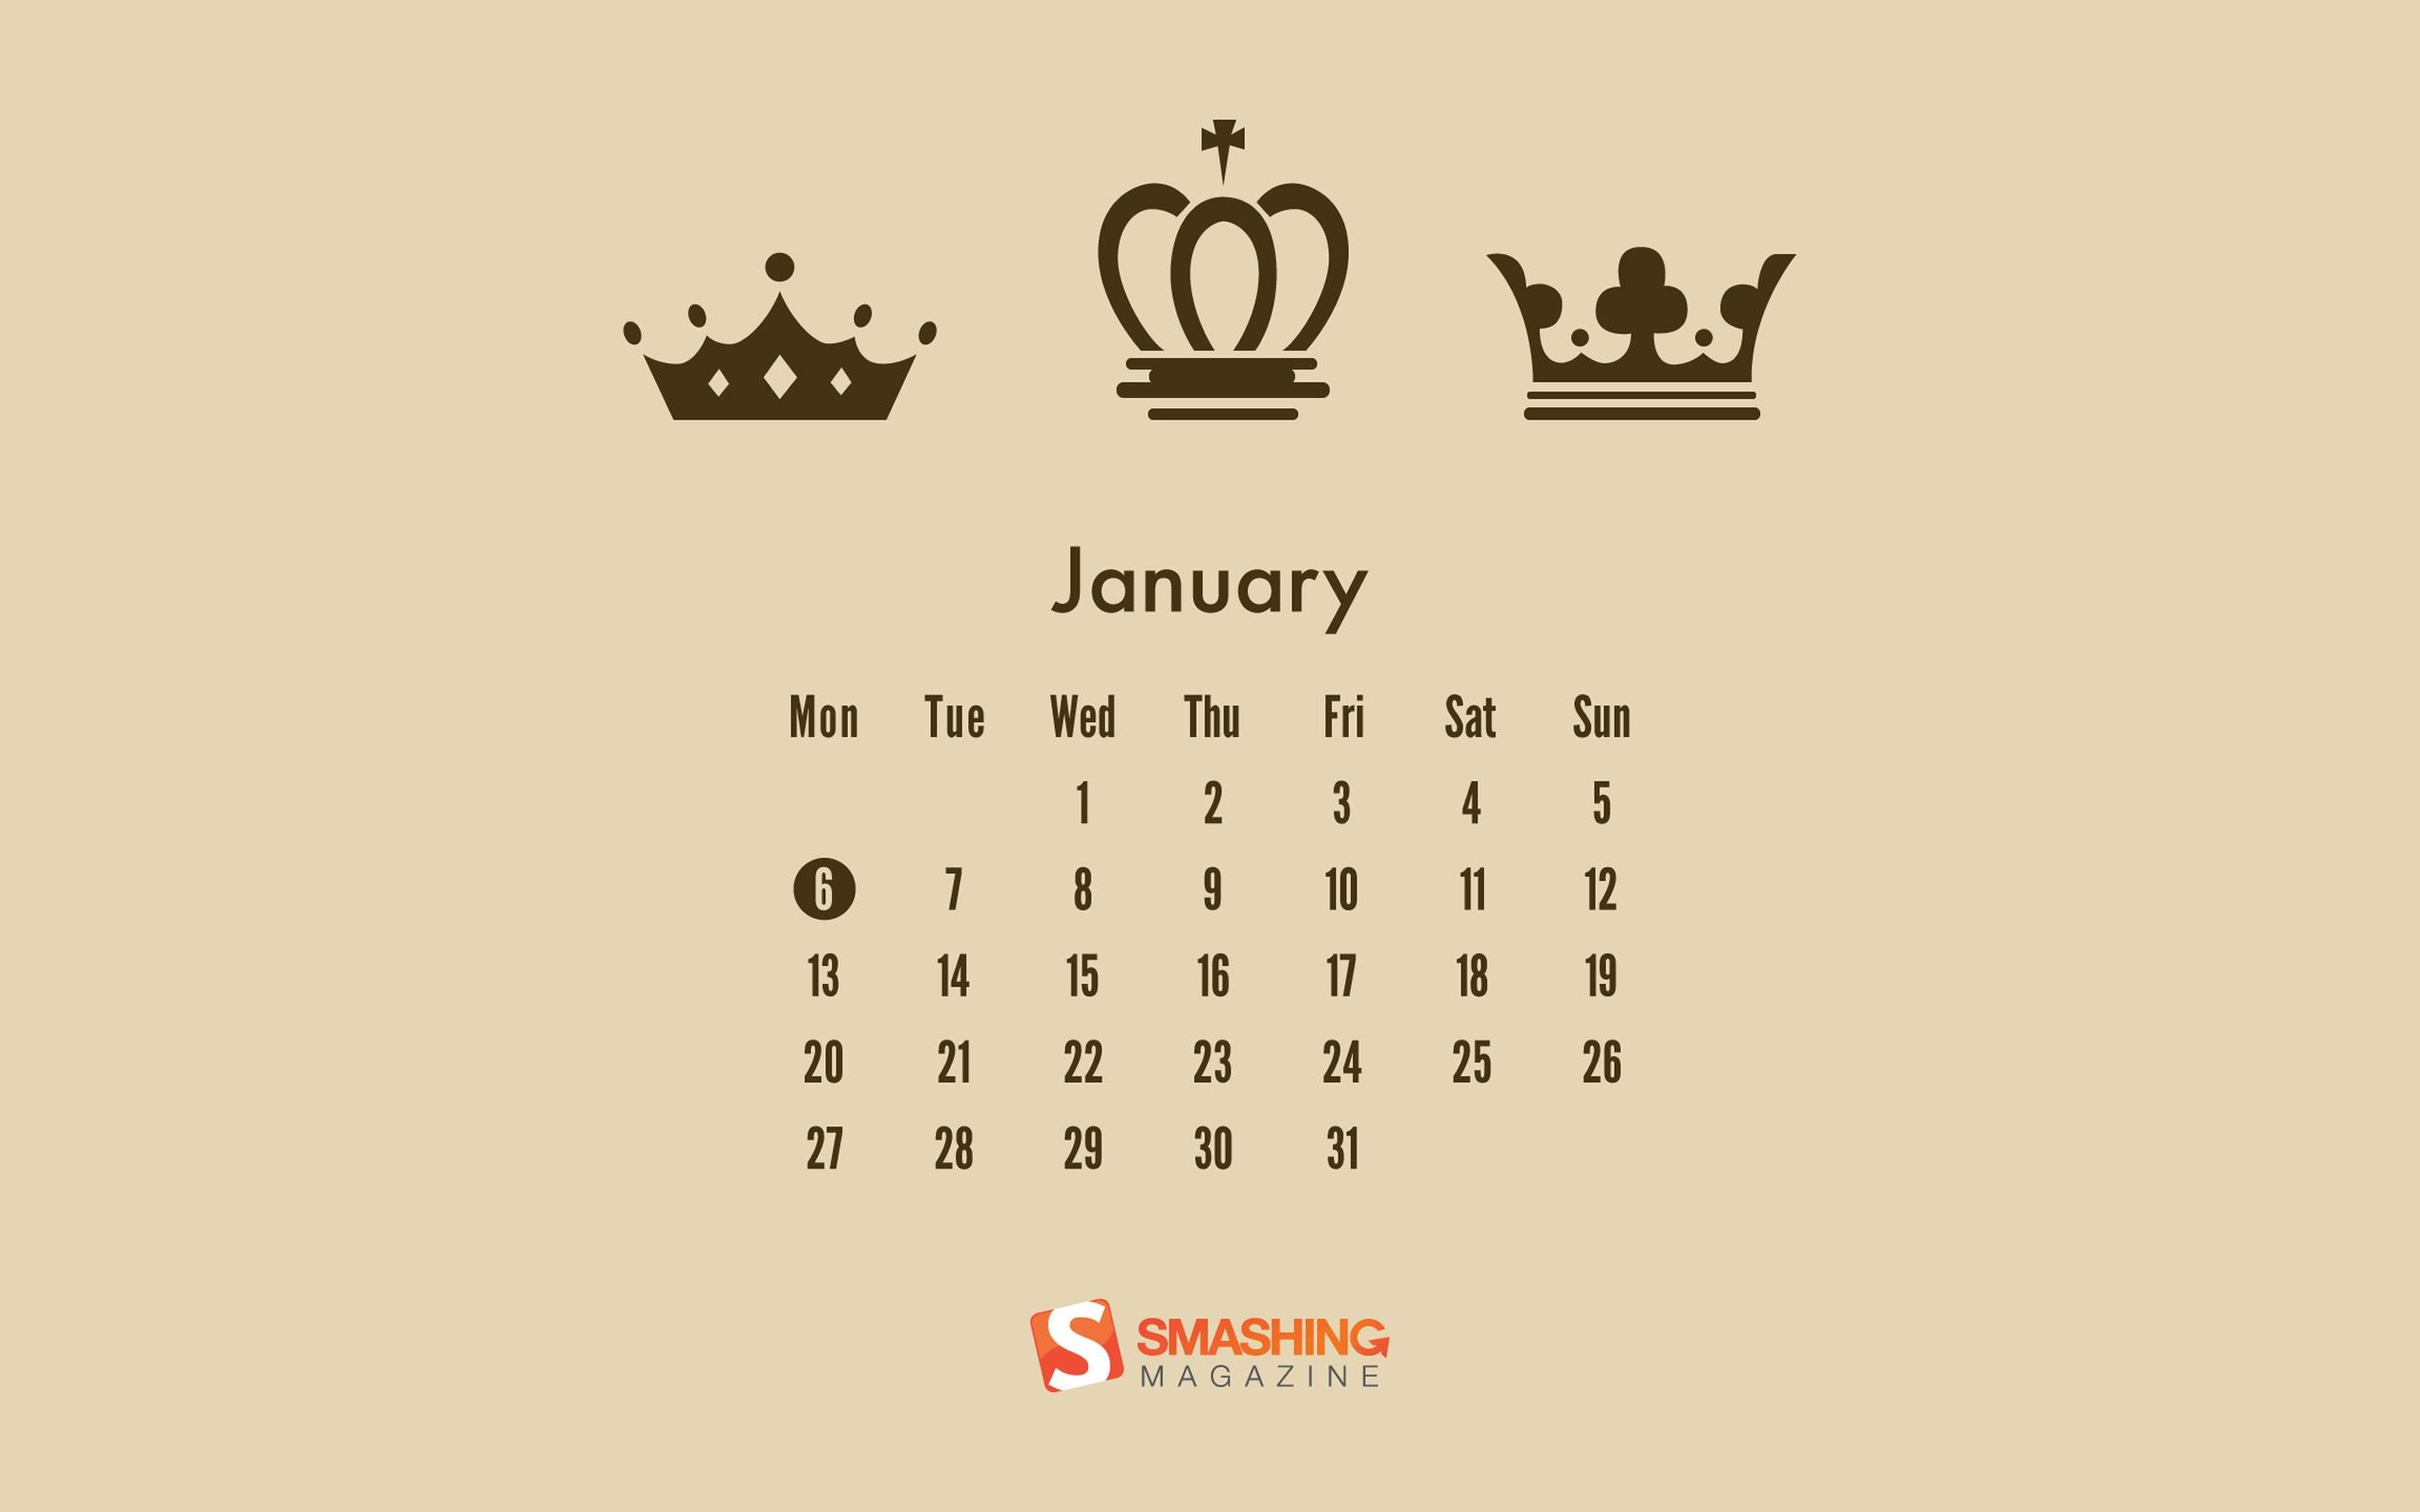 ... Night-January 2014 calendar wallpaper - 2560x1600 wallpaper download